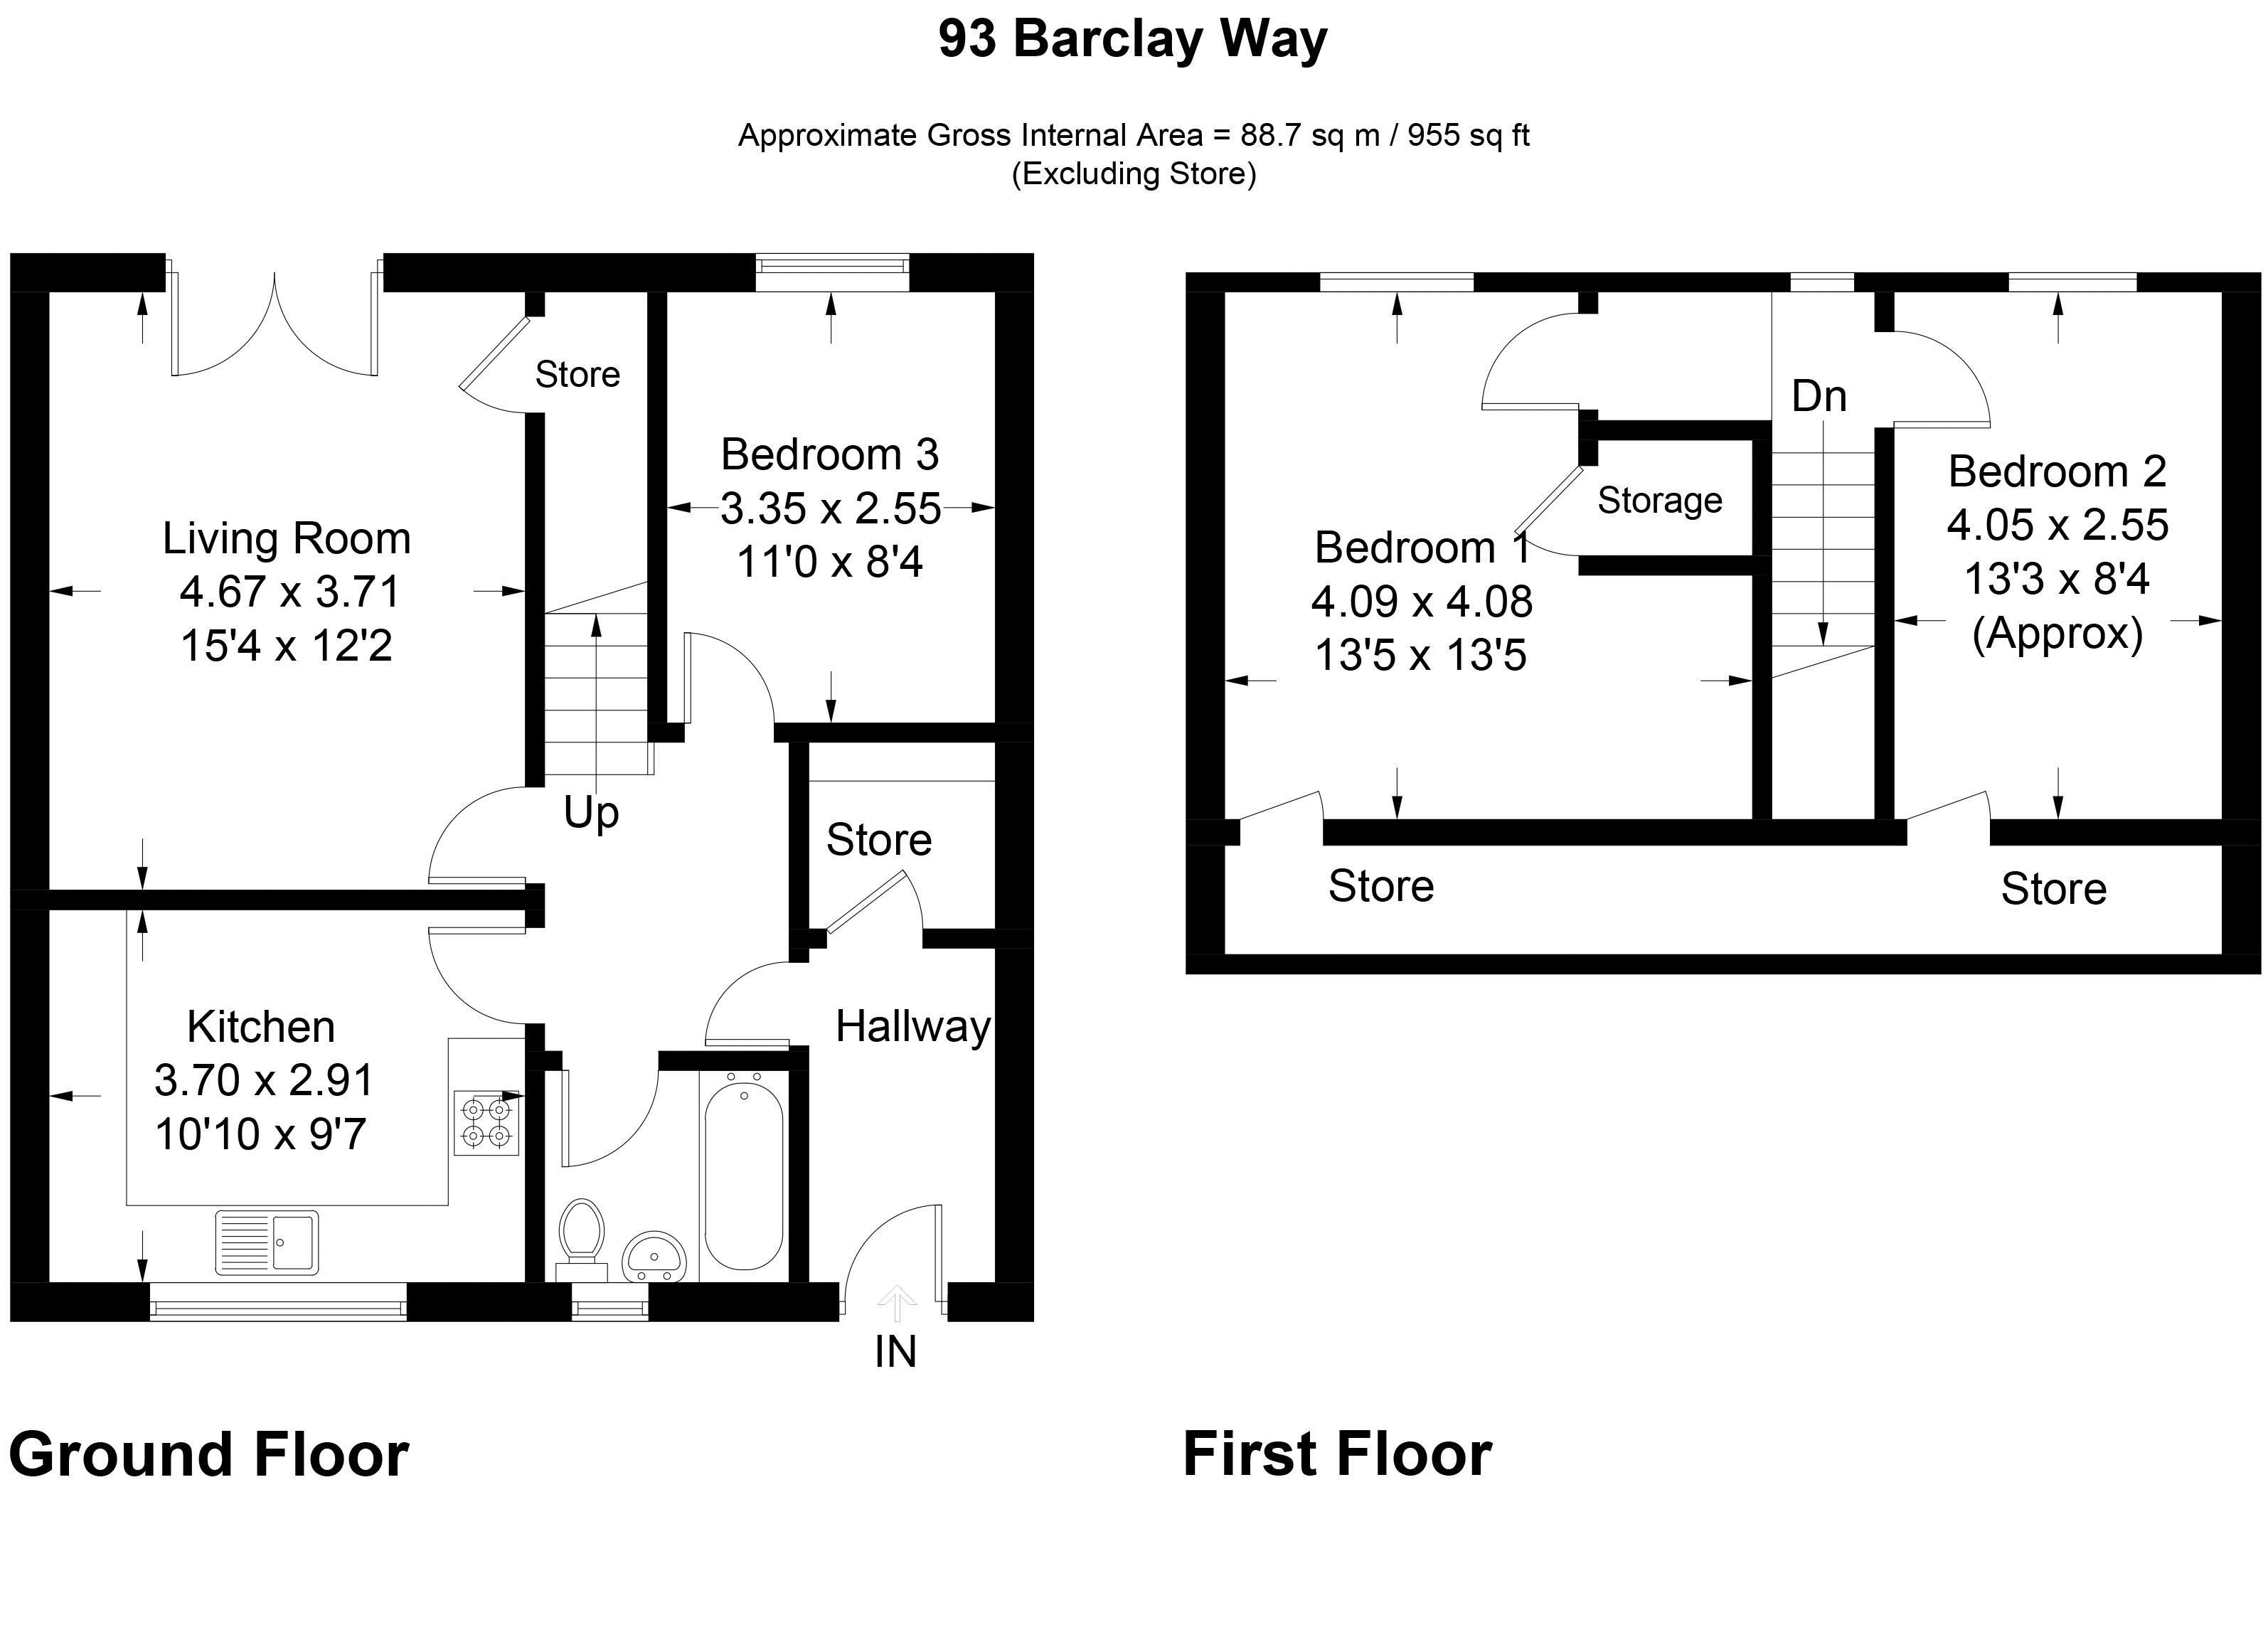 Barclay Way